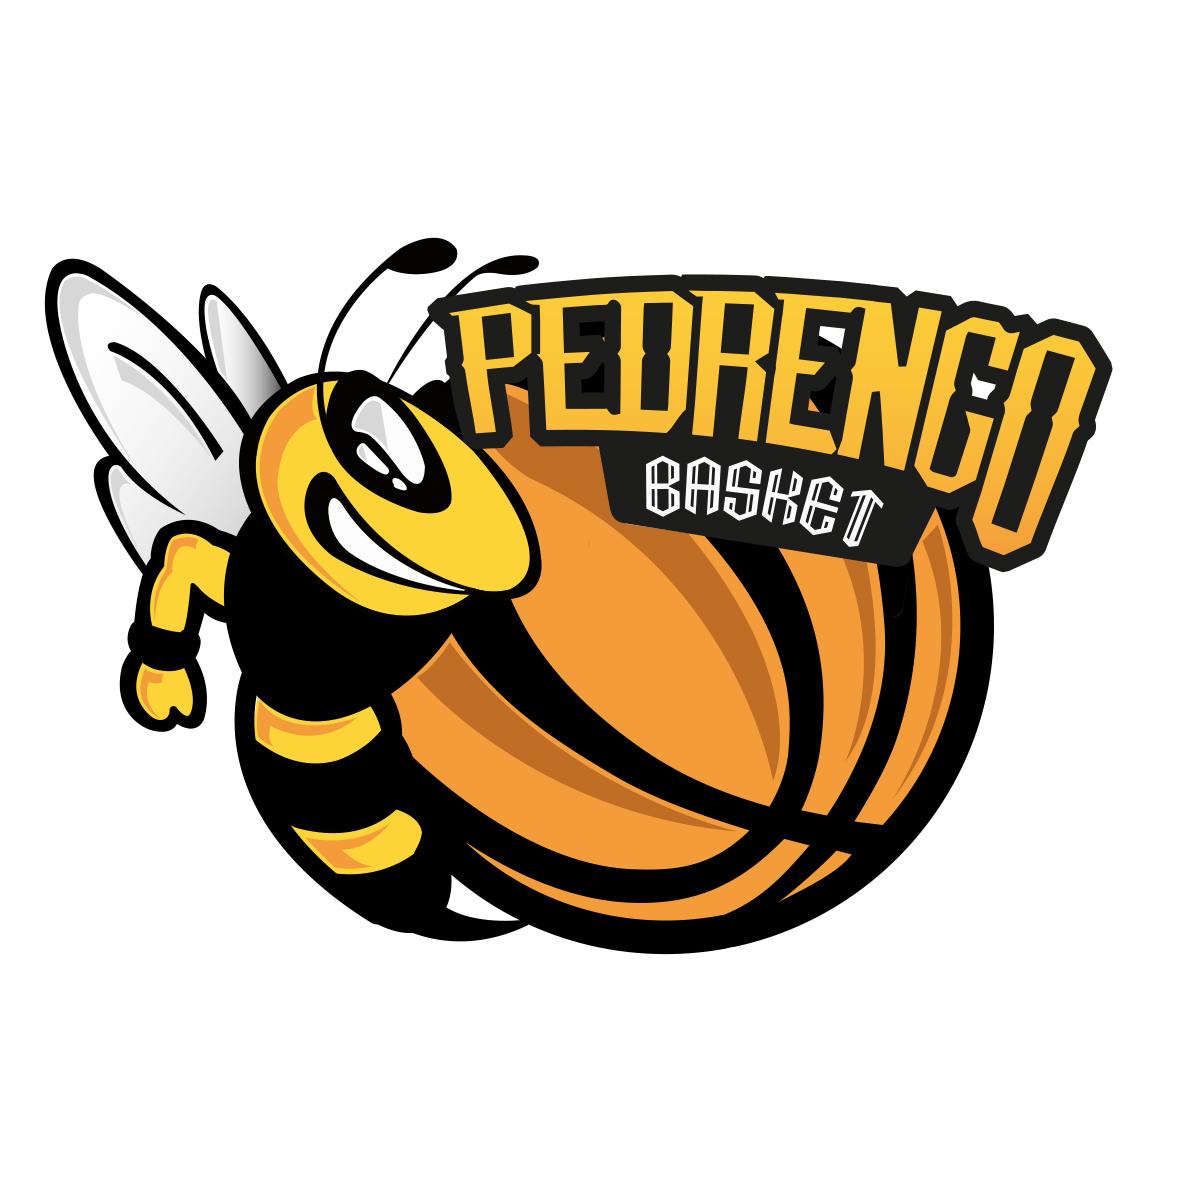 LogoPedrengo